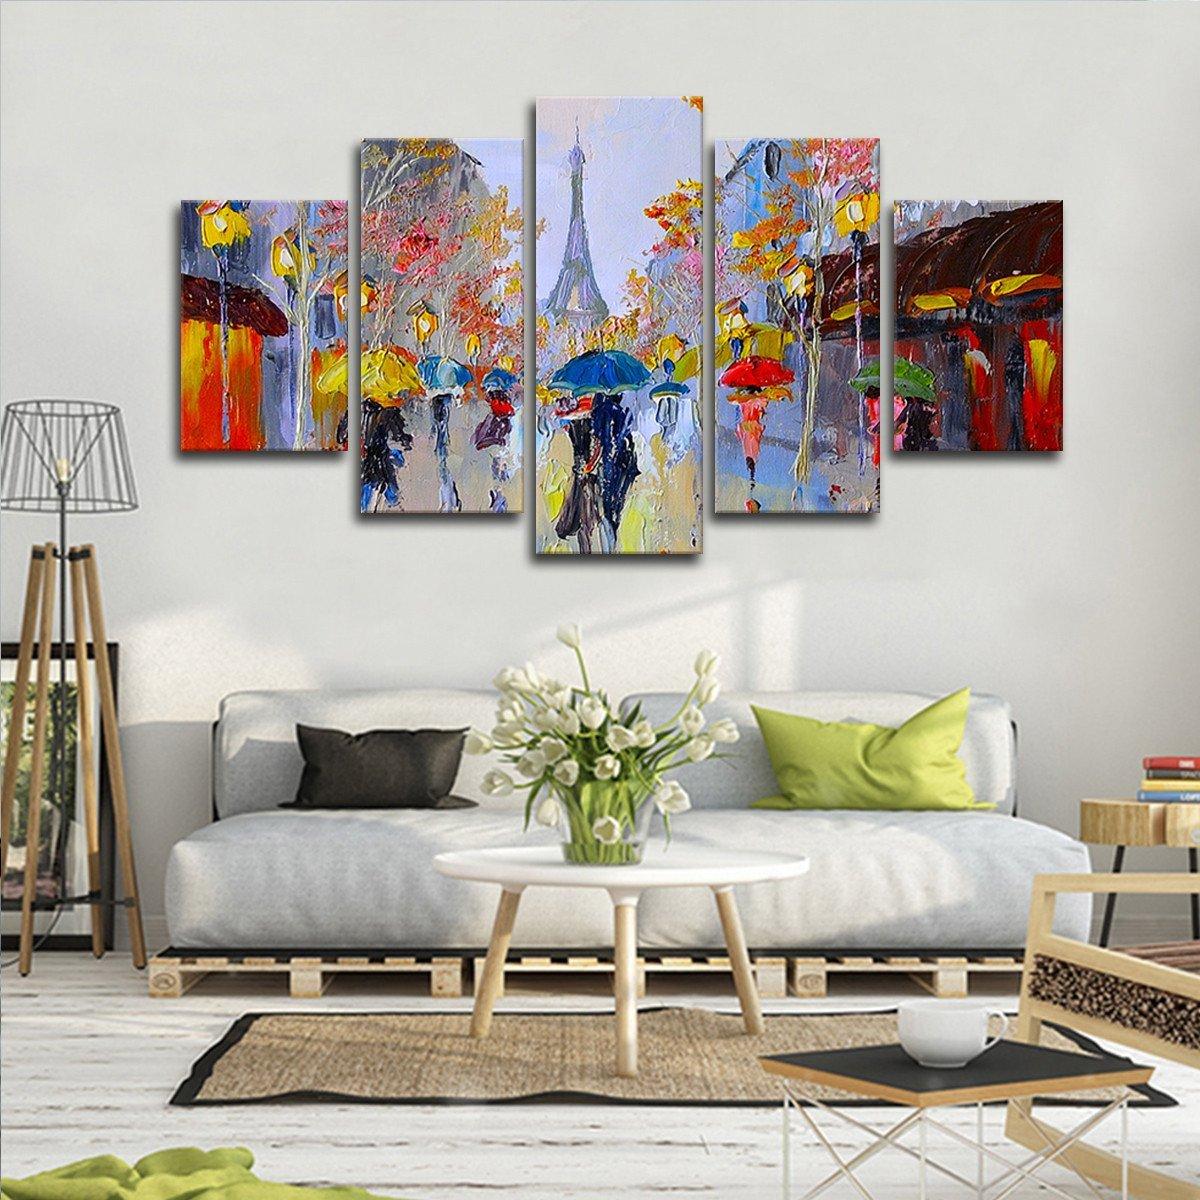 Eiffel Tower Painting Multi Panel Canvas Wall Art